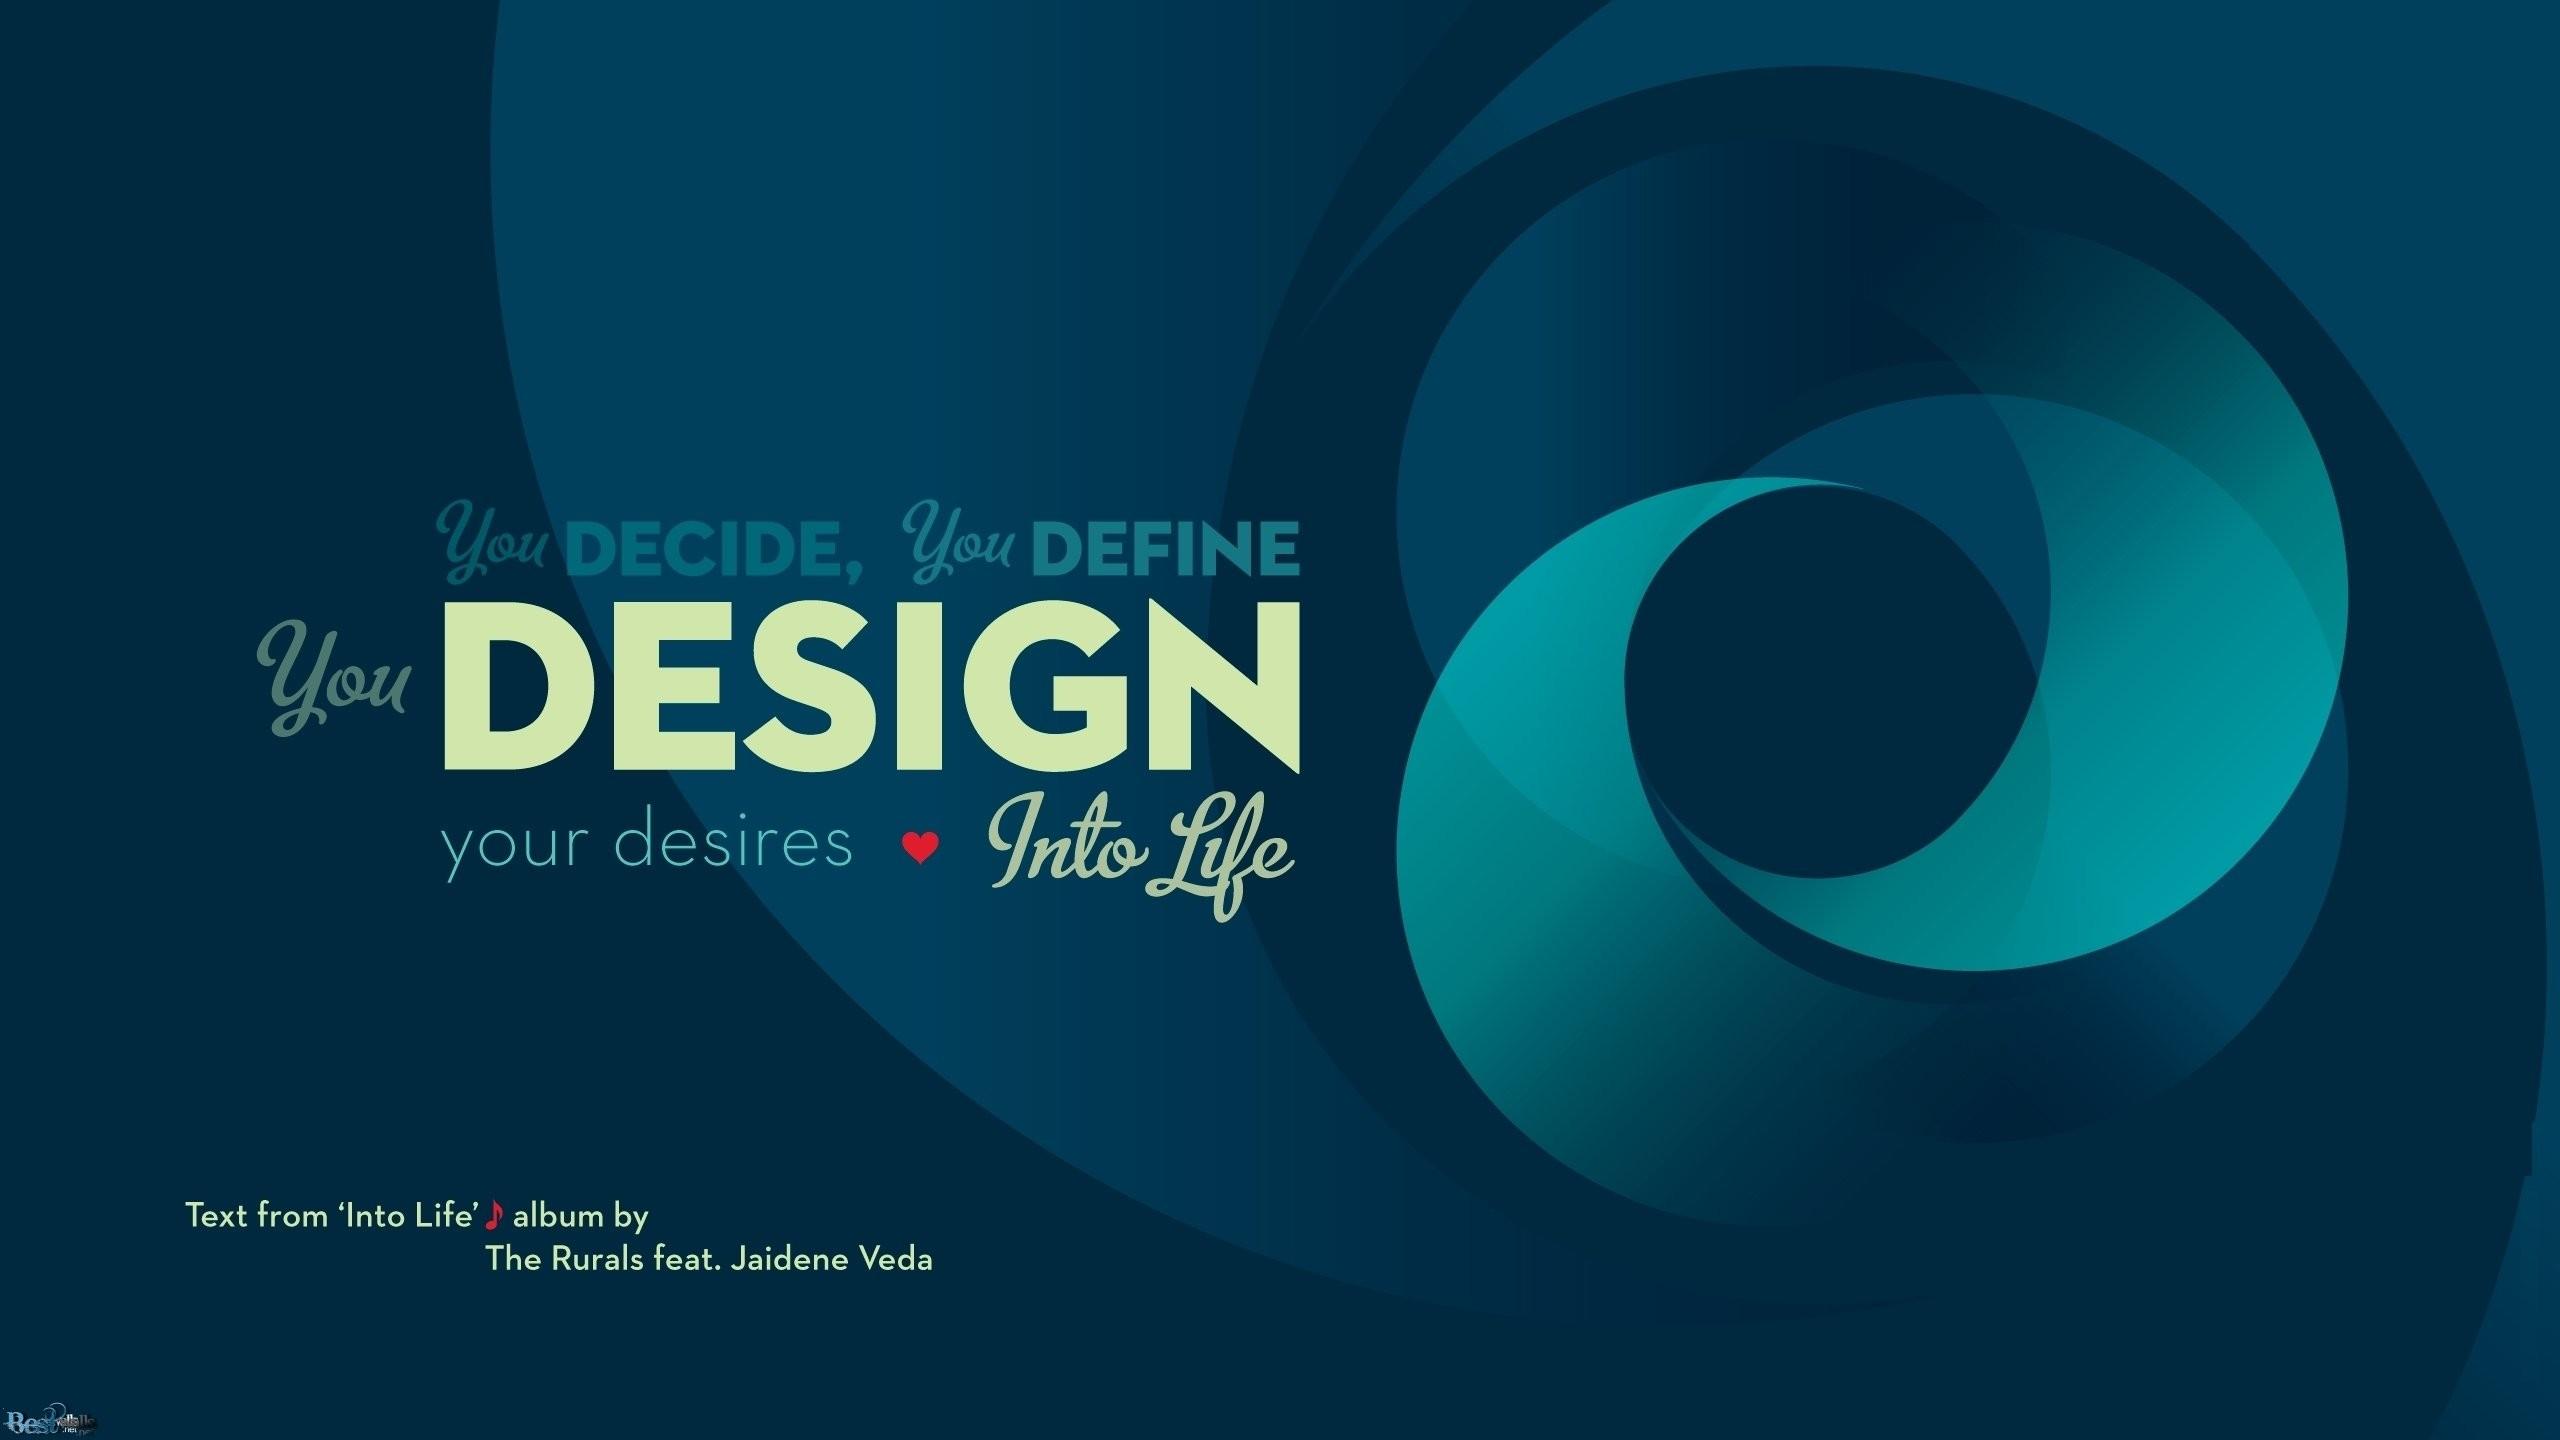 Designer wallpaper download free amazing full hd - Graphic design desktop wallpaper hd ...